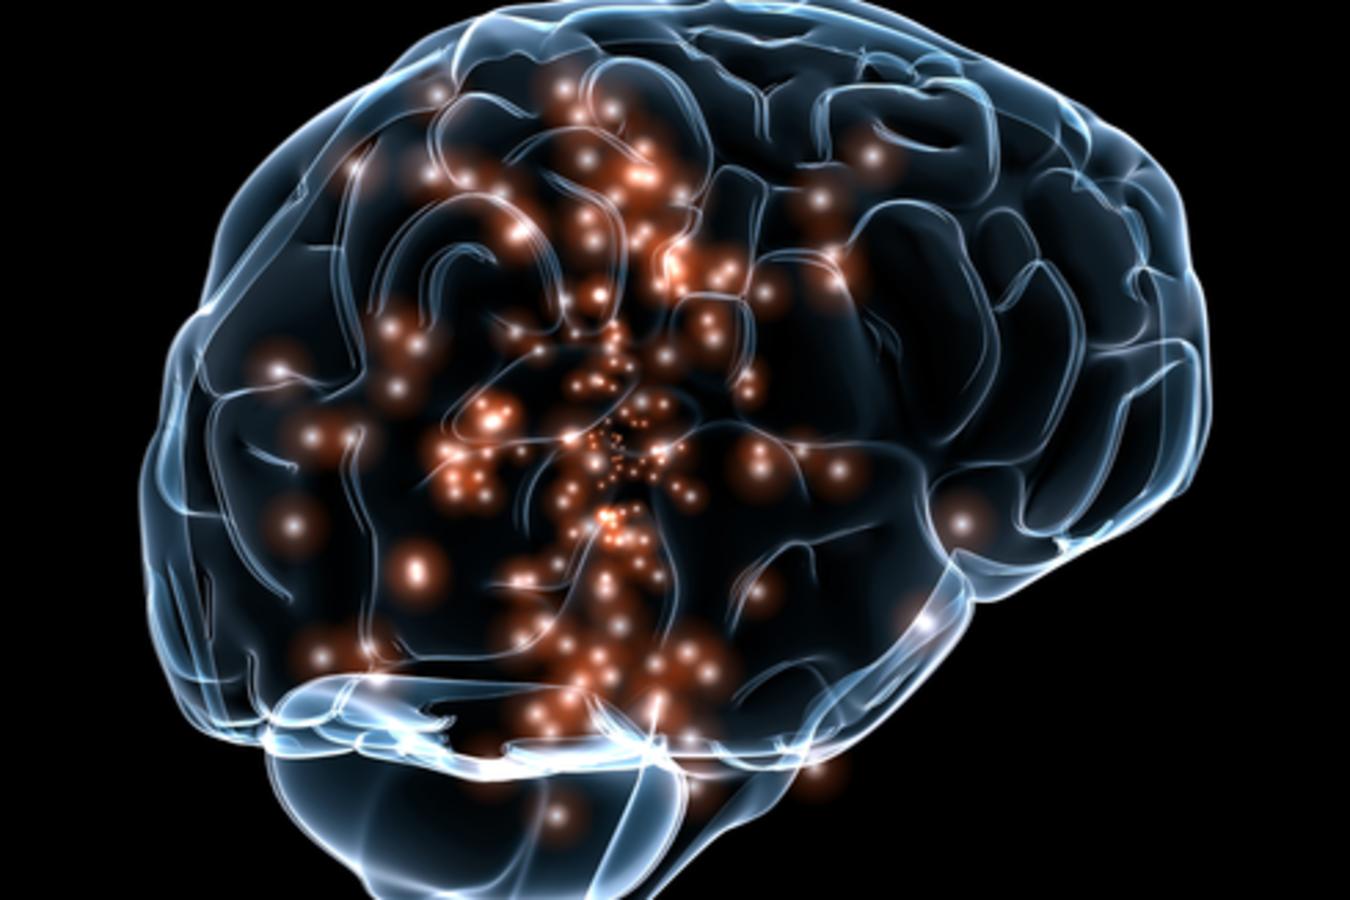 neuro Gallery